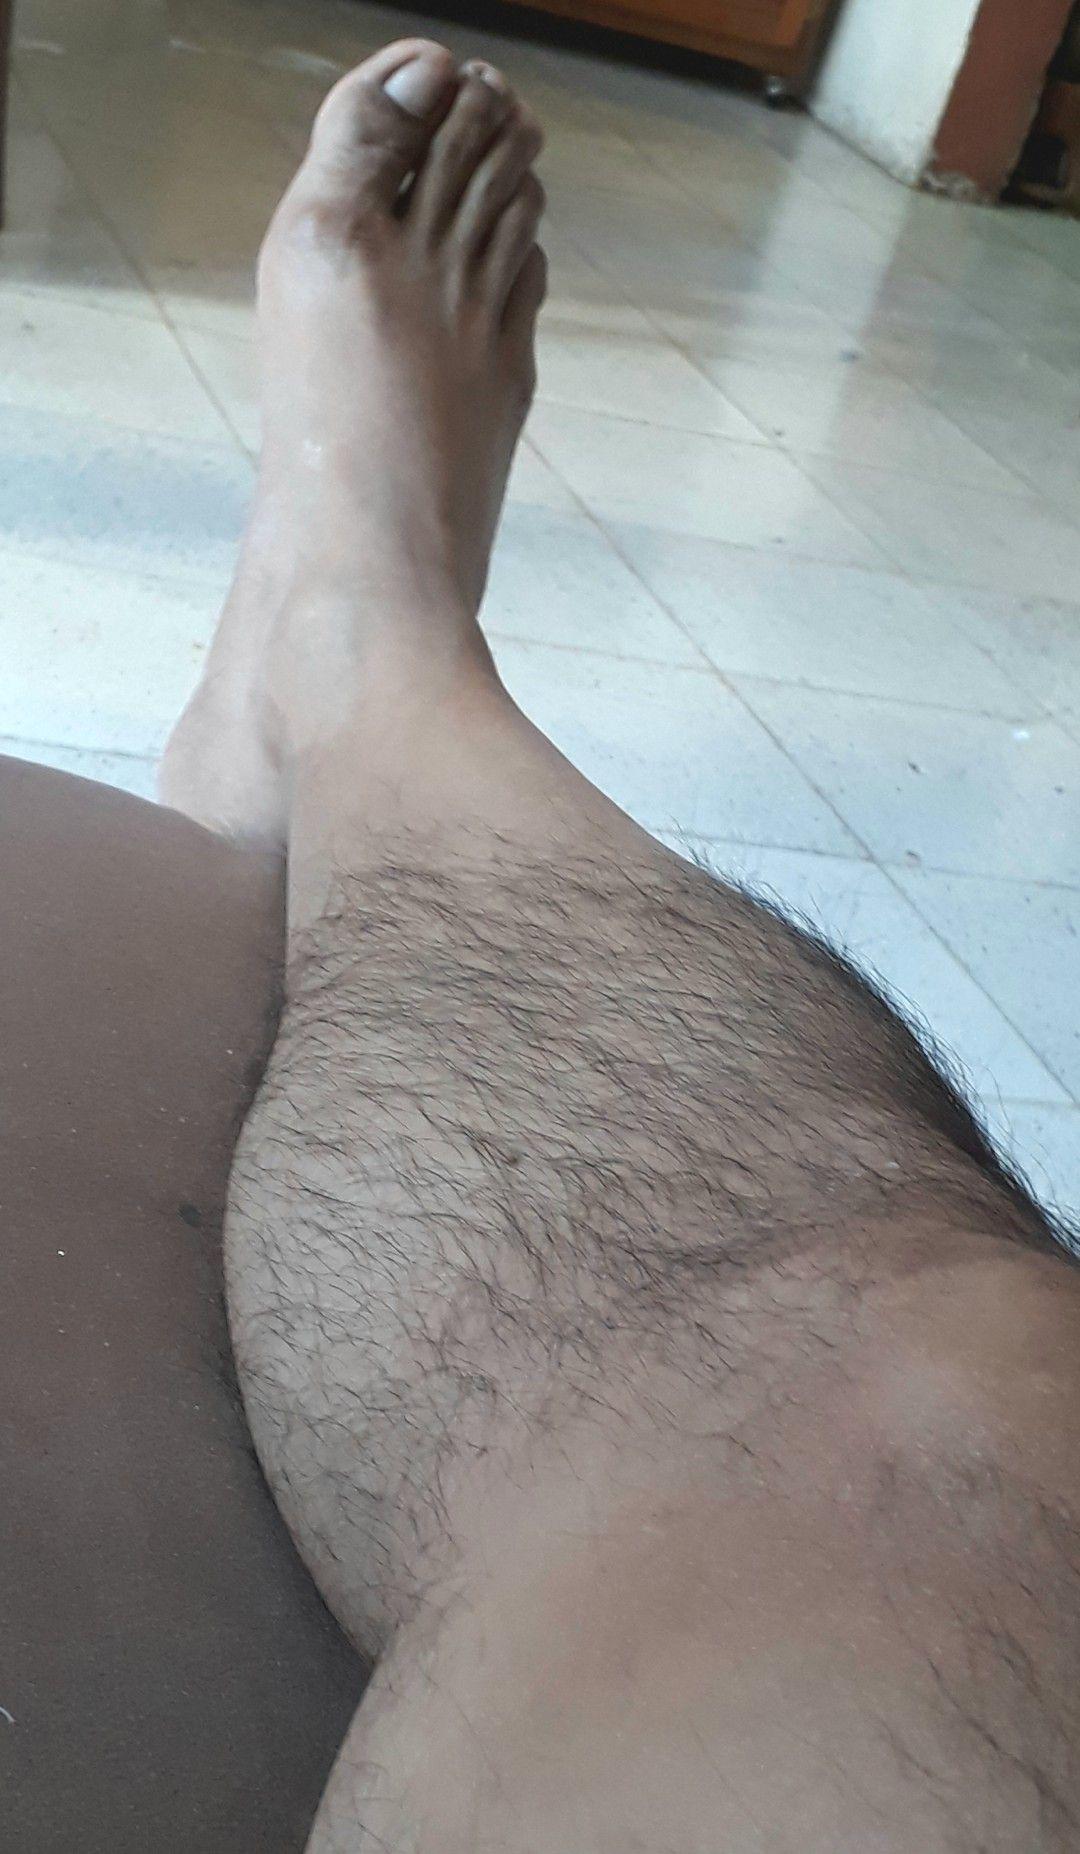 Bas et fetish gay homme pieds